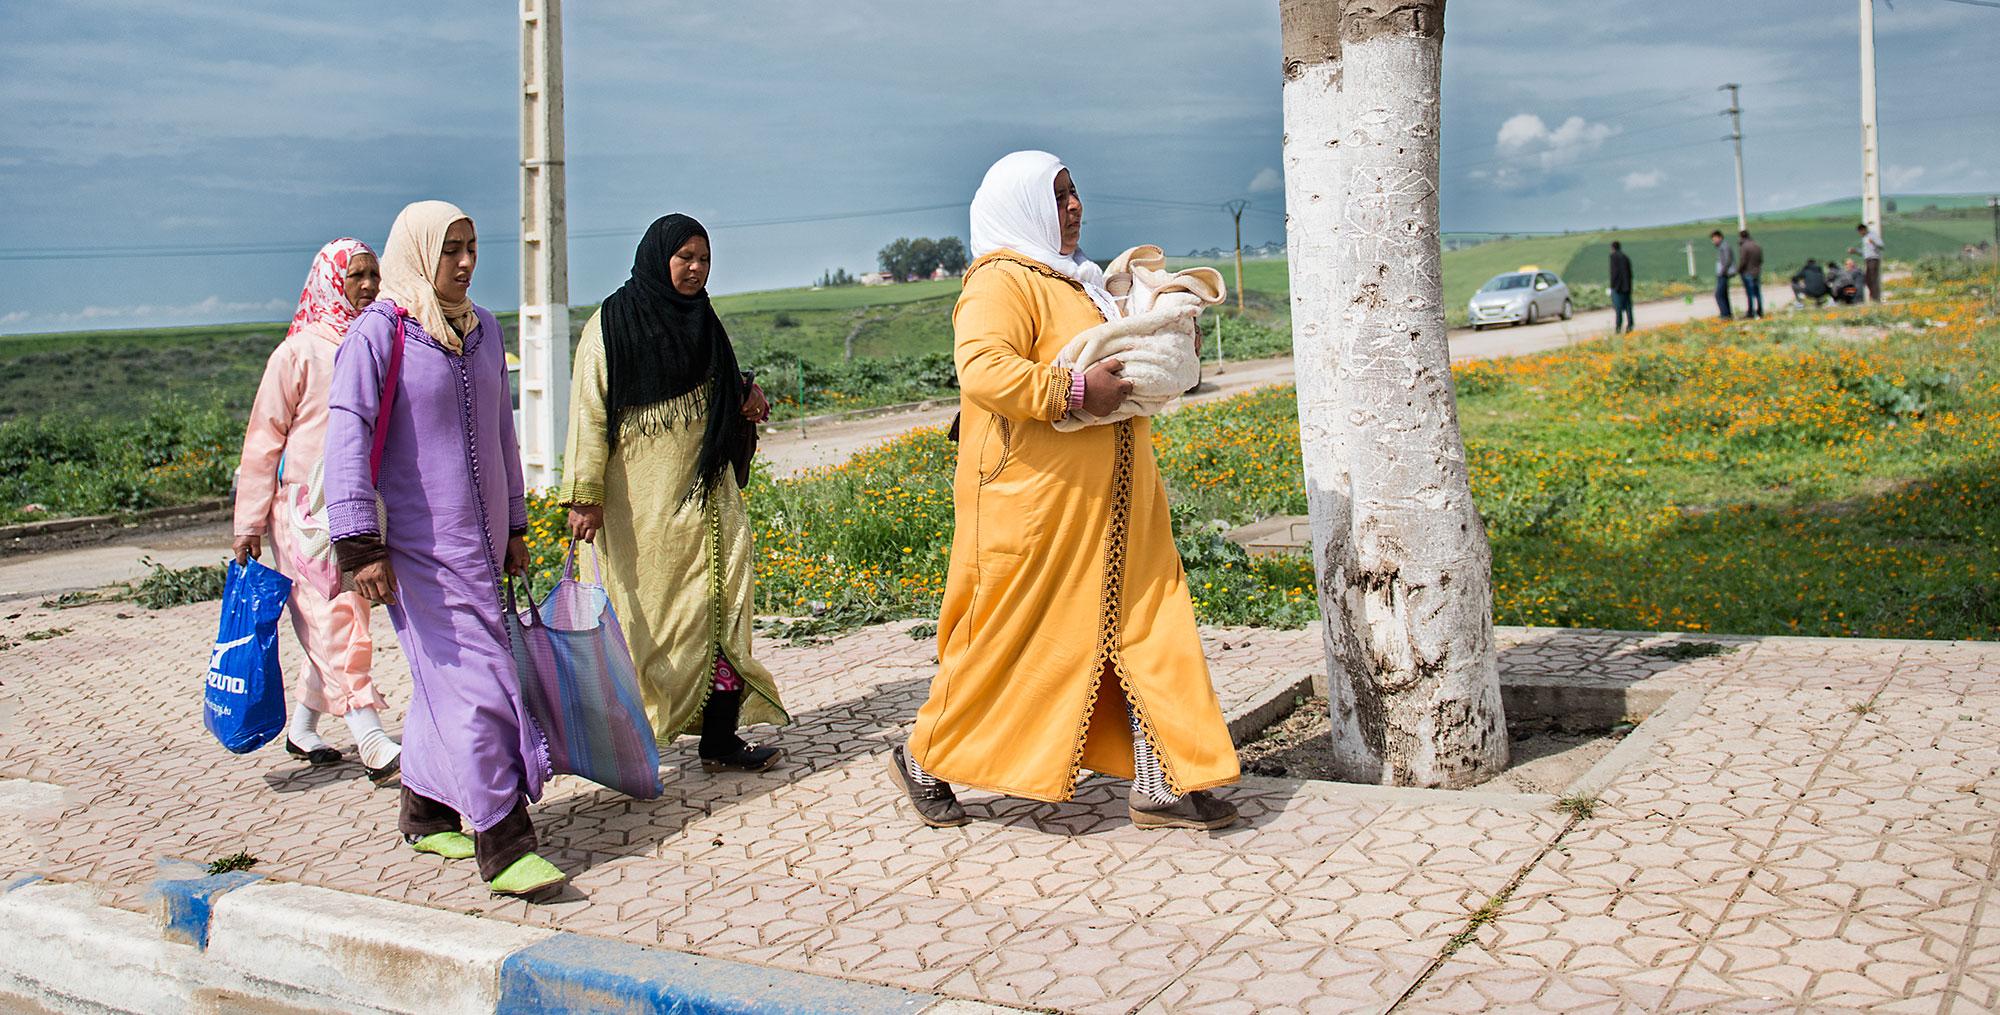 Muslim Woman in Morocco